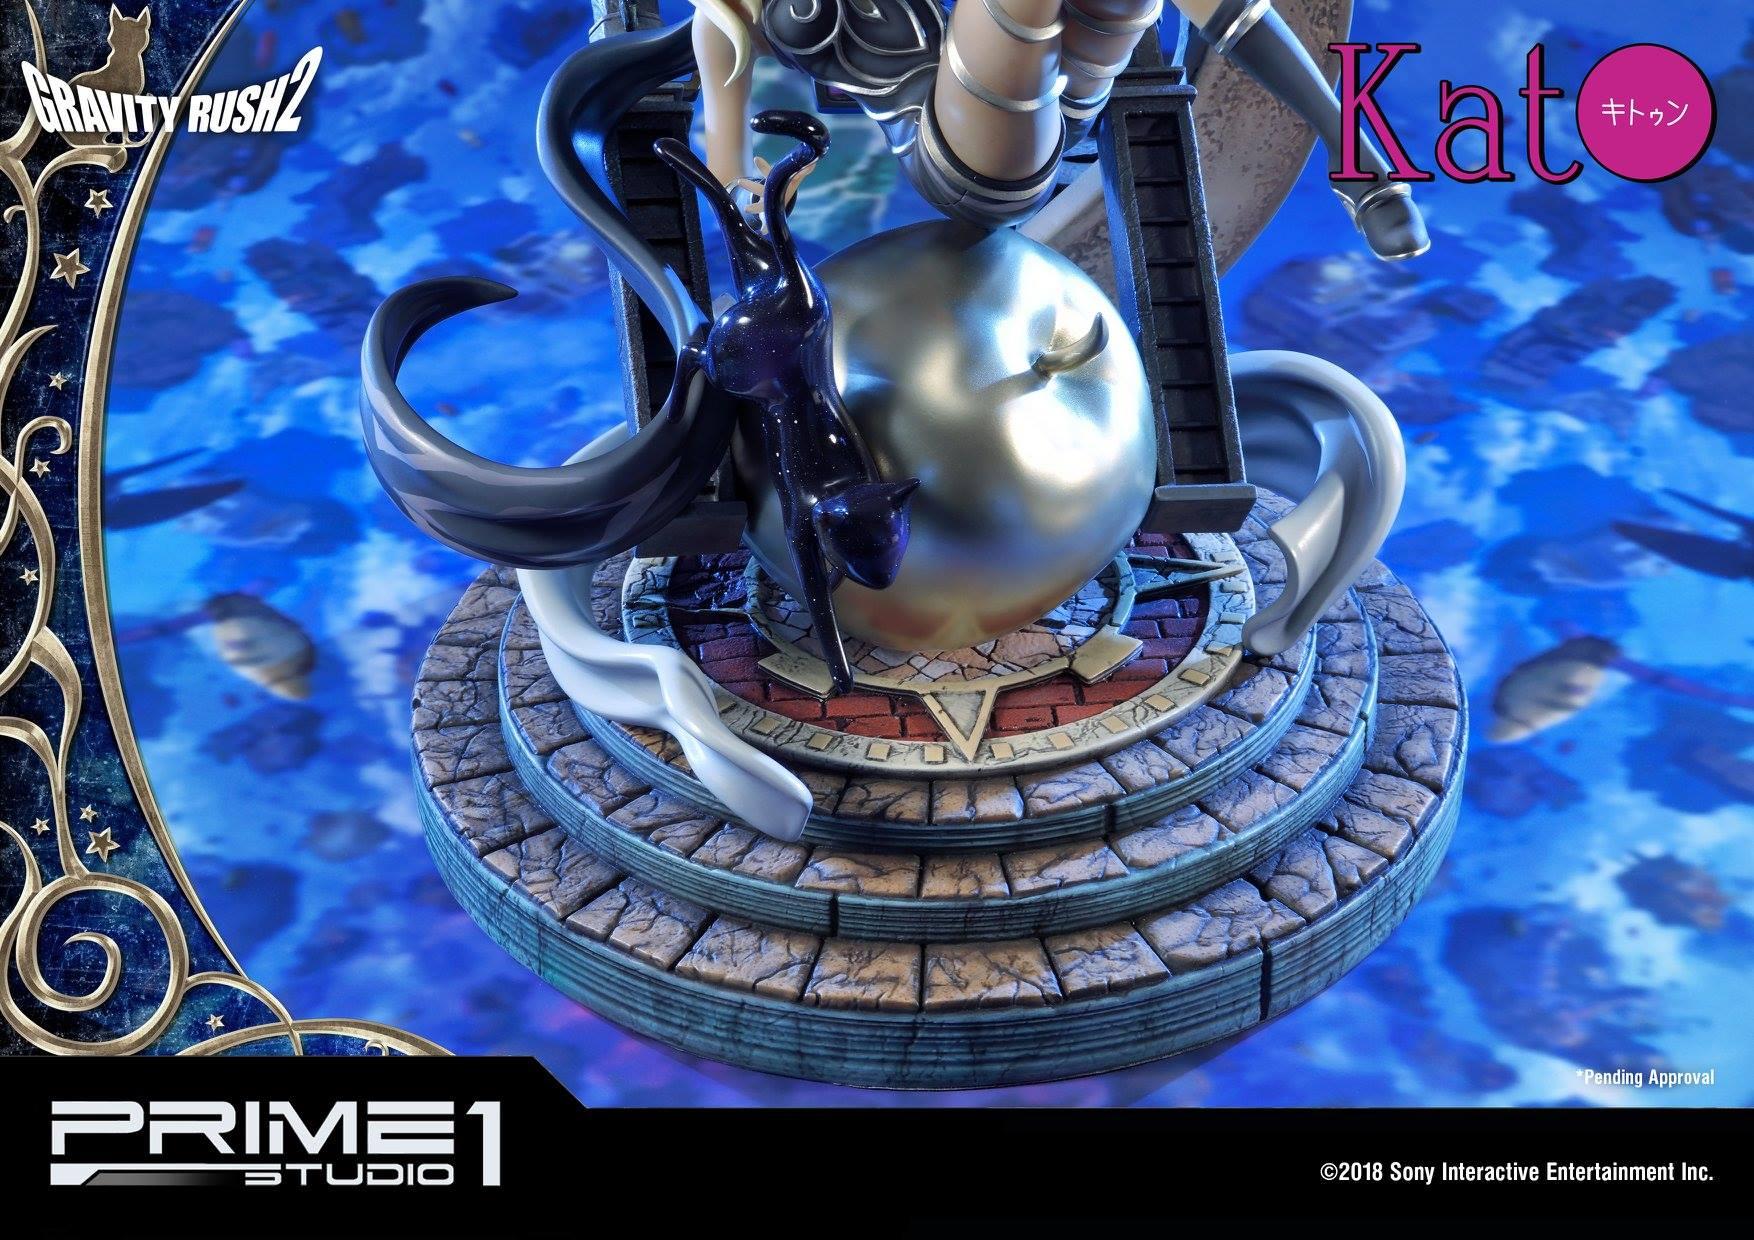 Prime_1_Studio_Kat_Prototype_CMGR2-01_34